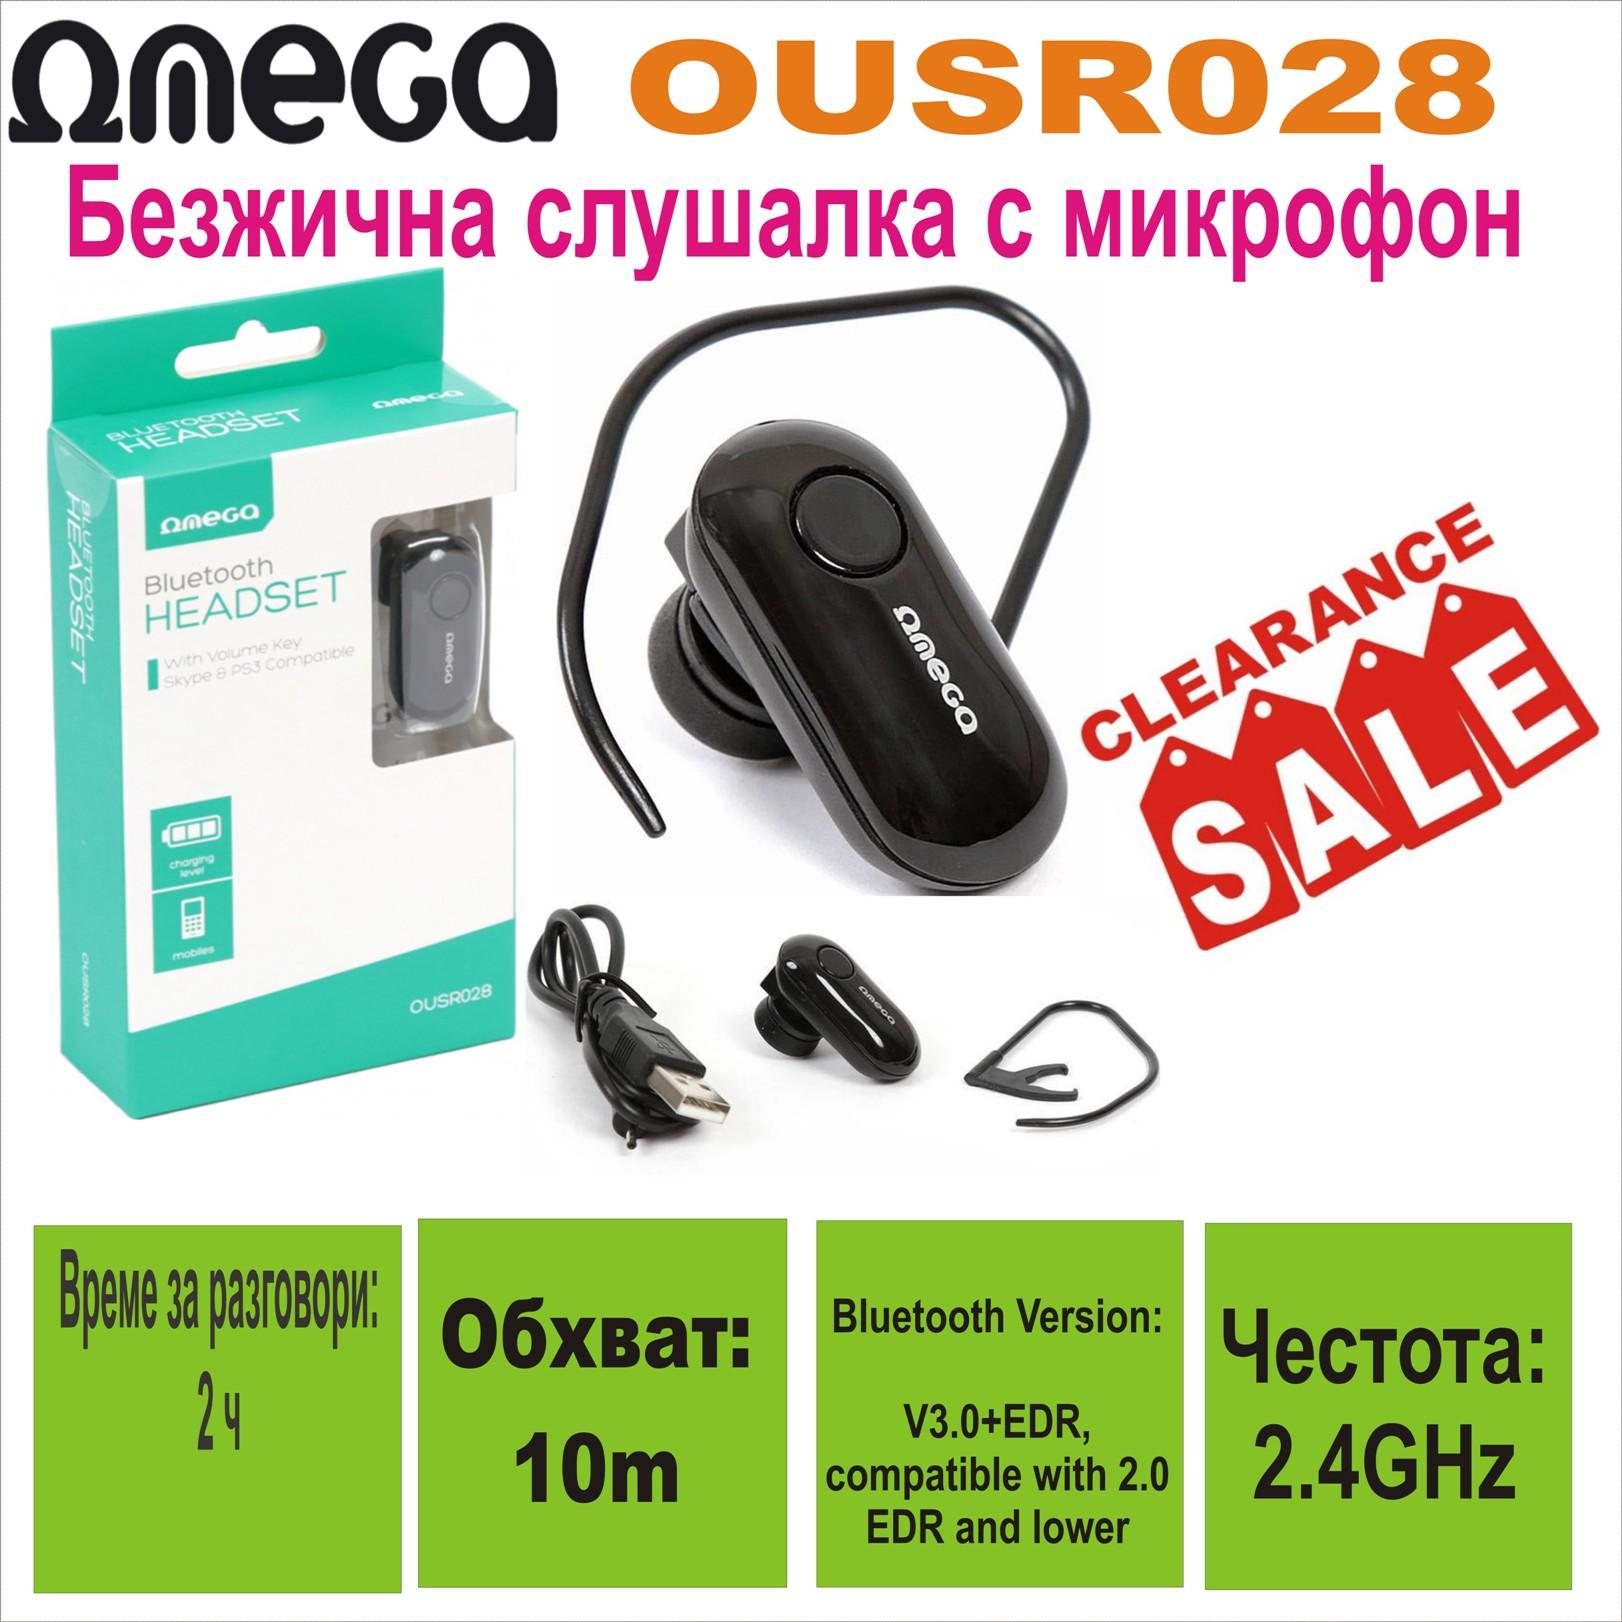 Безжично хендсфри Omega OUSR028, Bluetooth